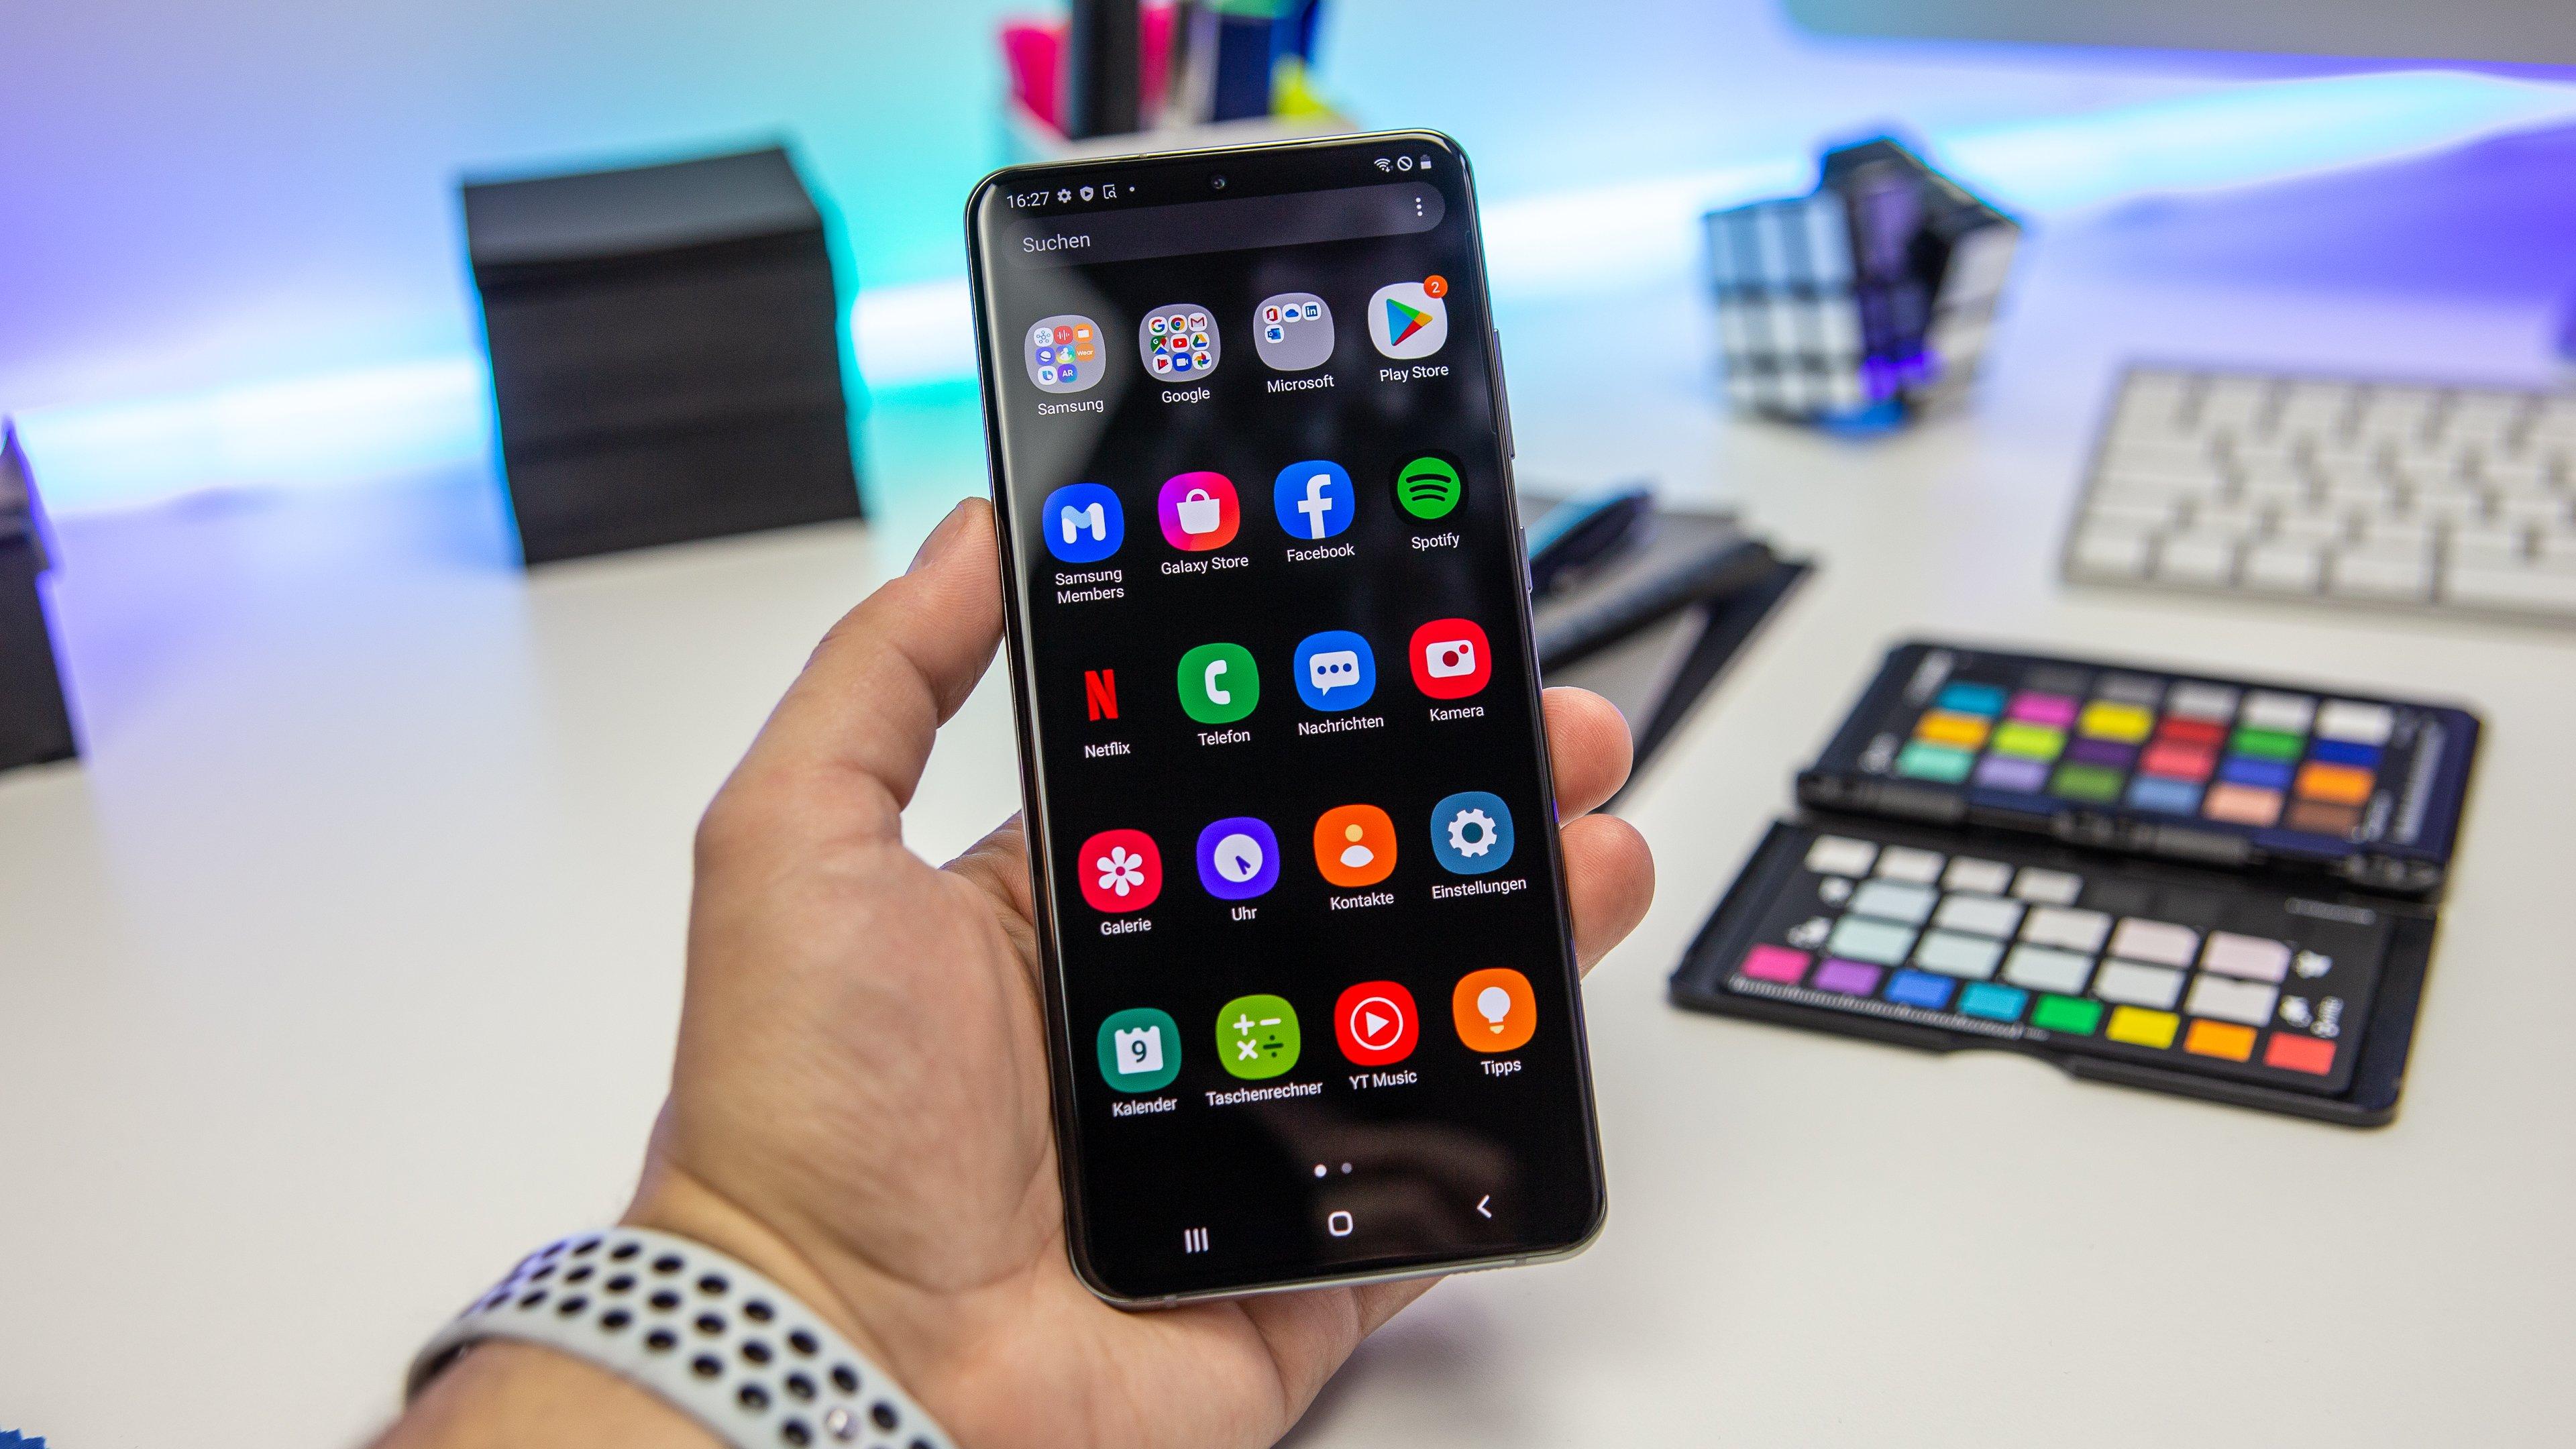 Cara Hapus Aplikasi Bawaan Android (Bloatware) - Teknologi.id